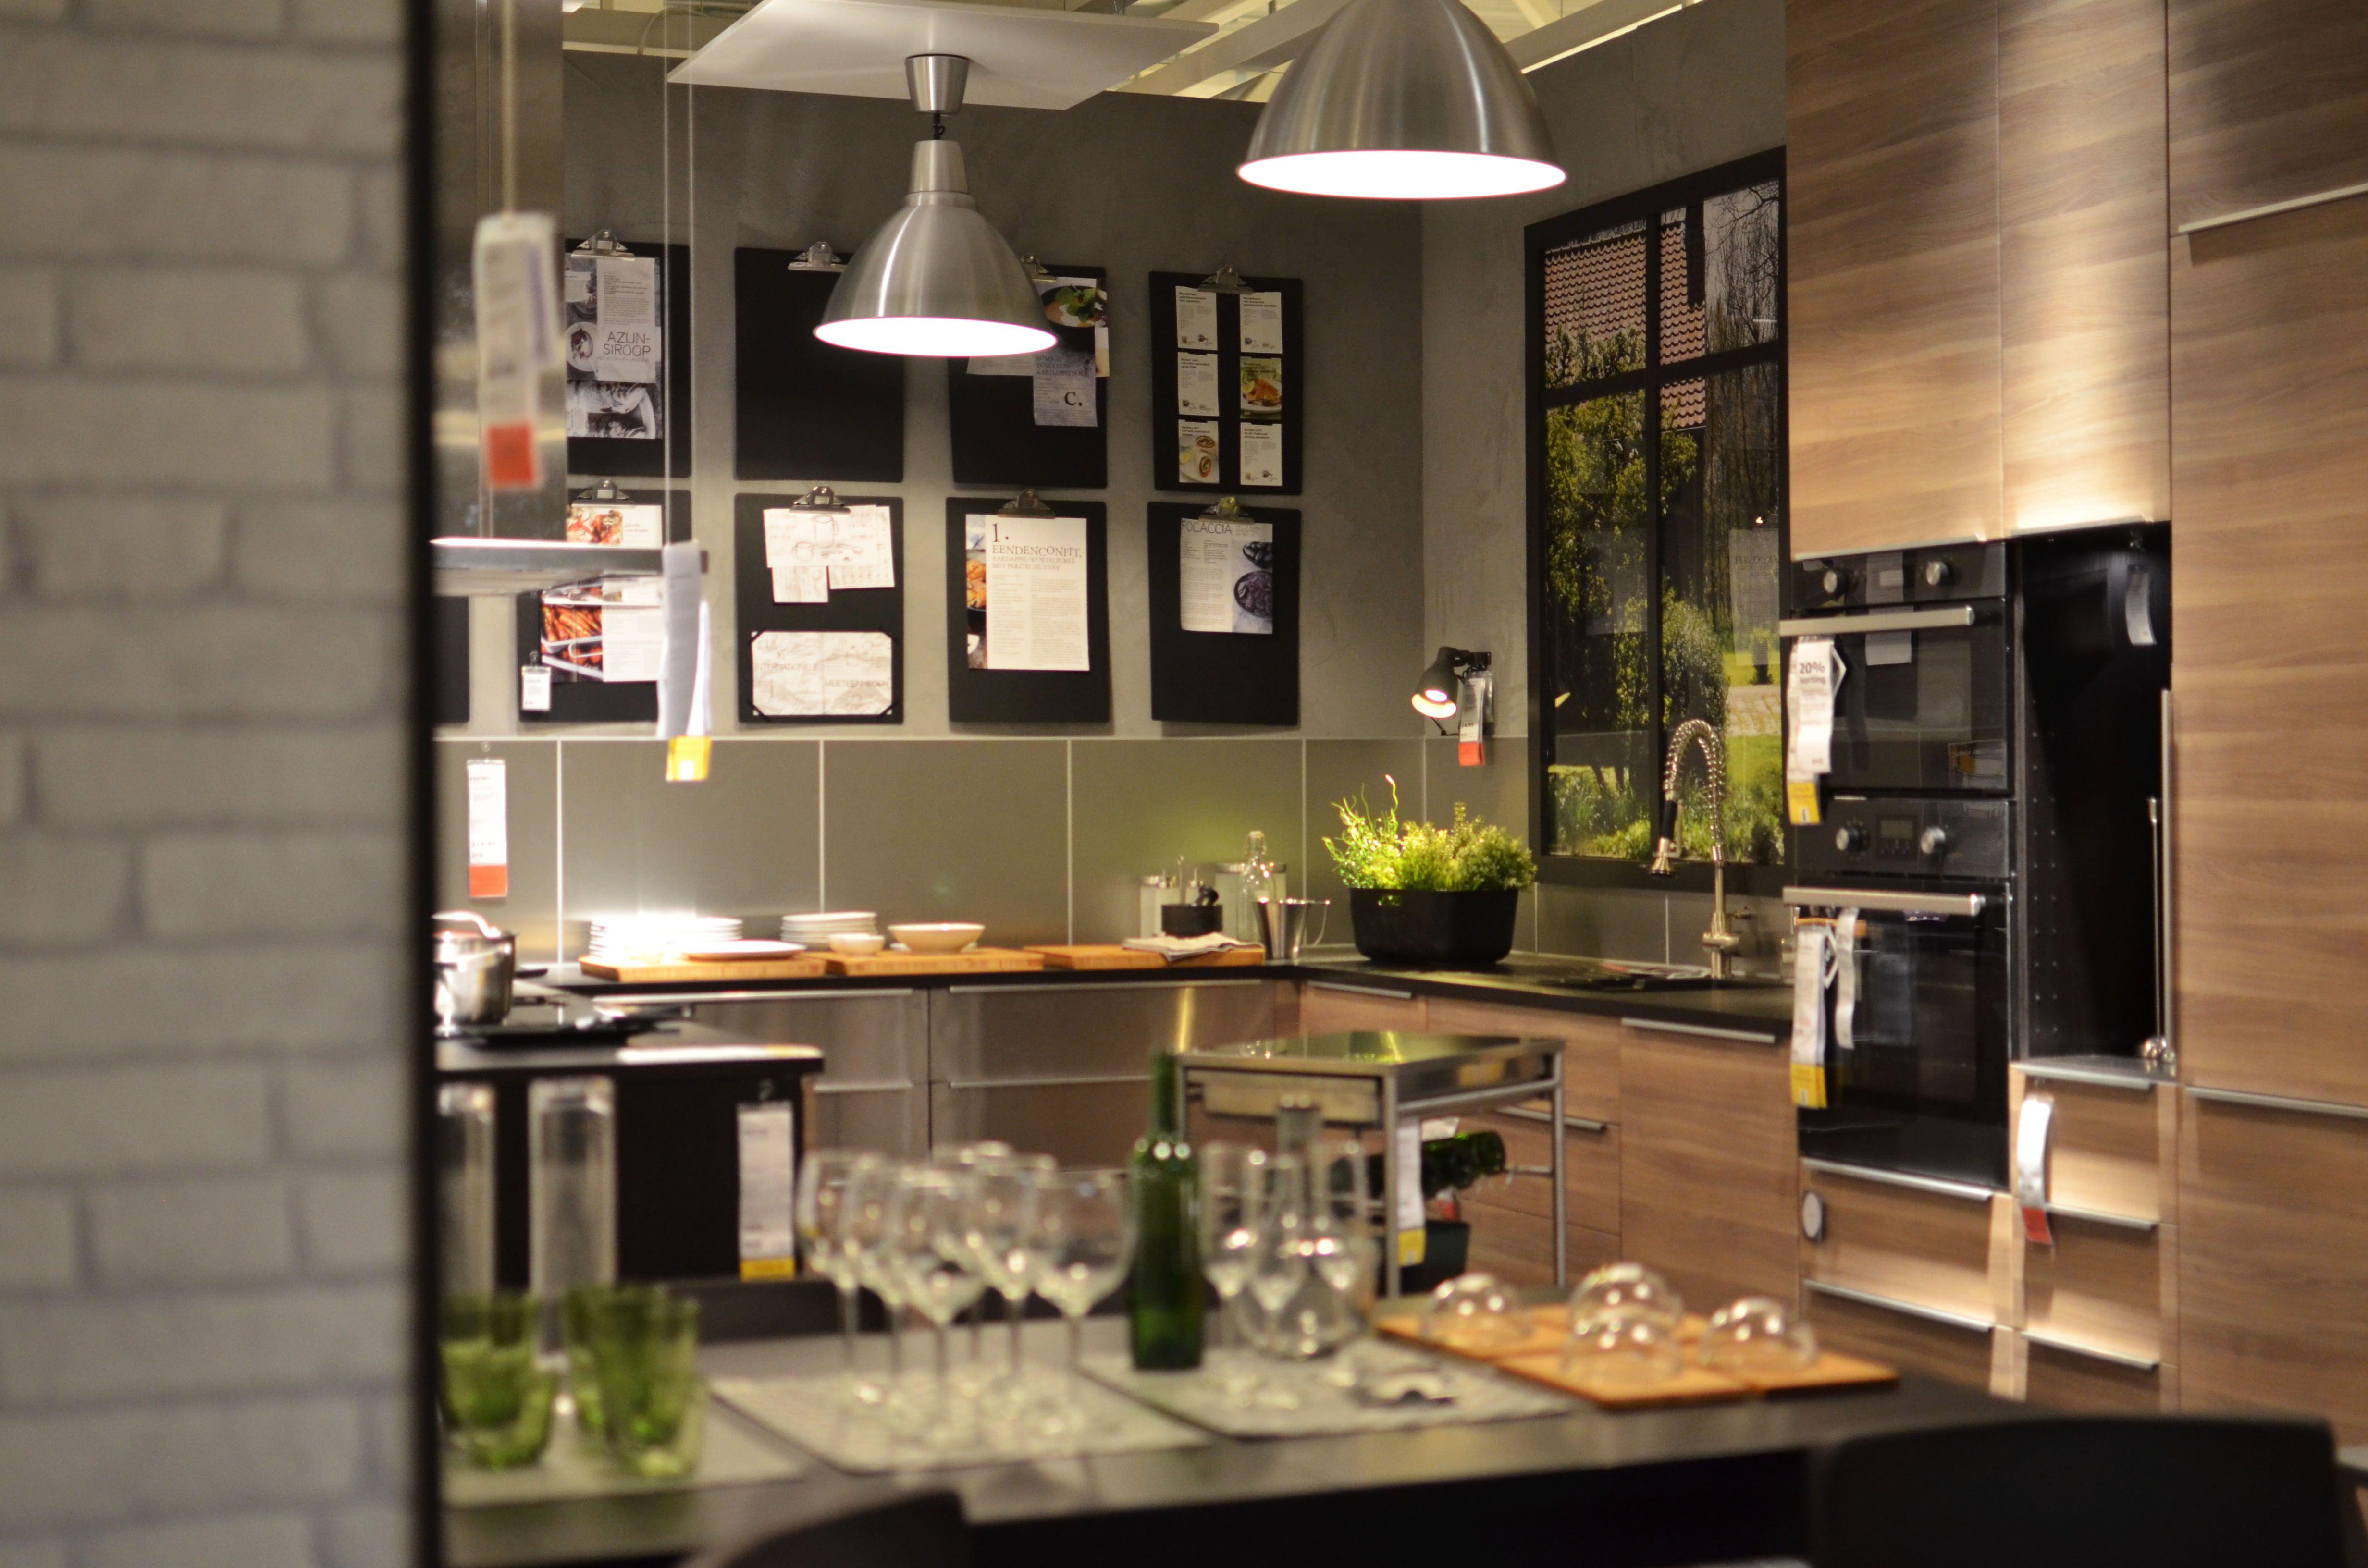 IKEA Delft | METOD Kitchen | BROKHULT Walnut | GREVSTA Stainless Steel |  Recipe Wall |